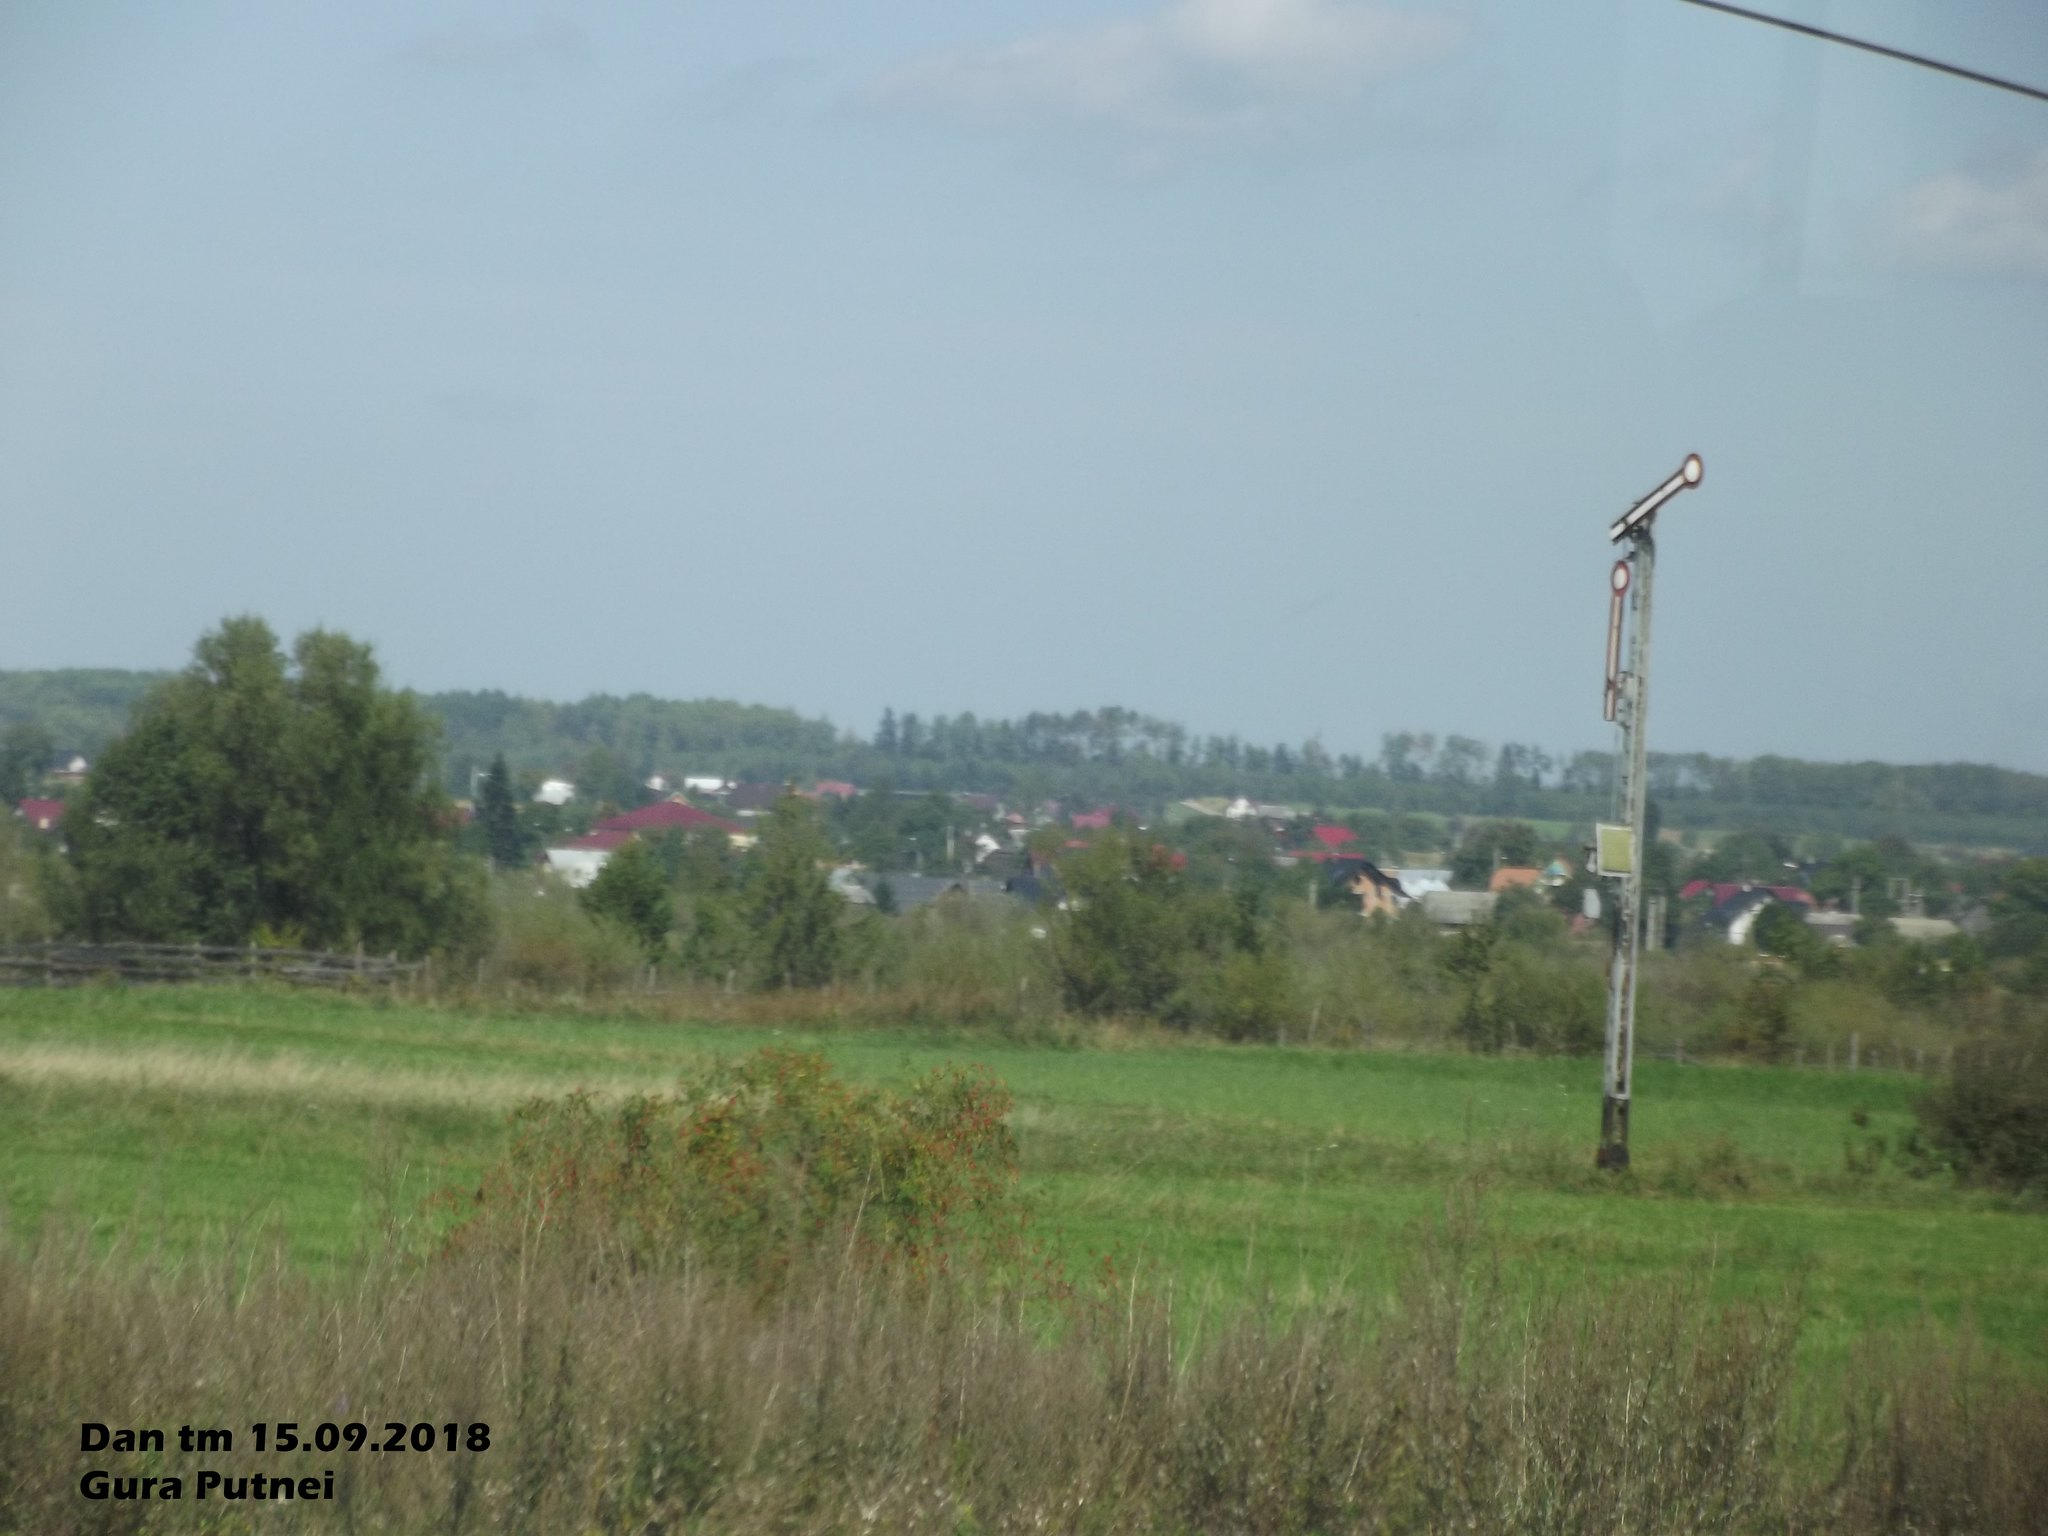 515 : Dorneşti - Gura Putnei - (Putna) - Nisipitu - Seletin UKR - Pagina 47 44016740964_d145eb92de_k